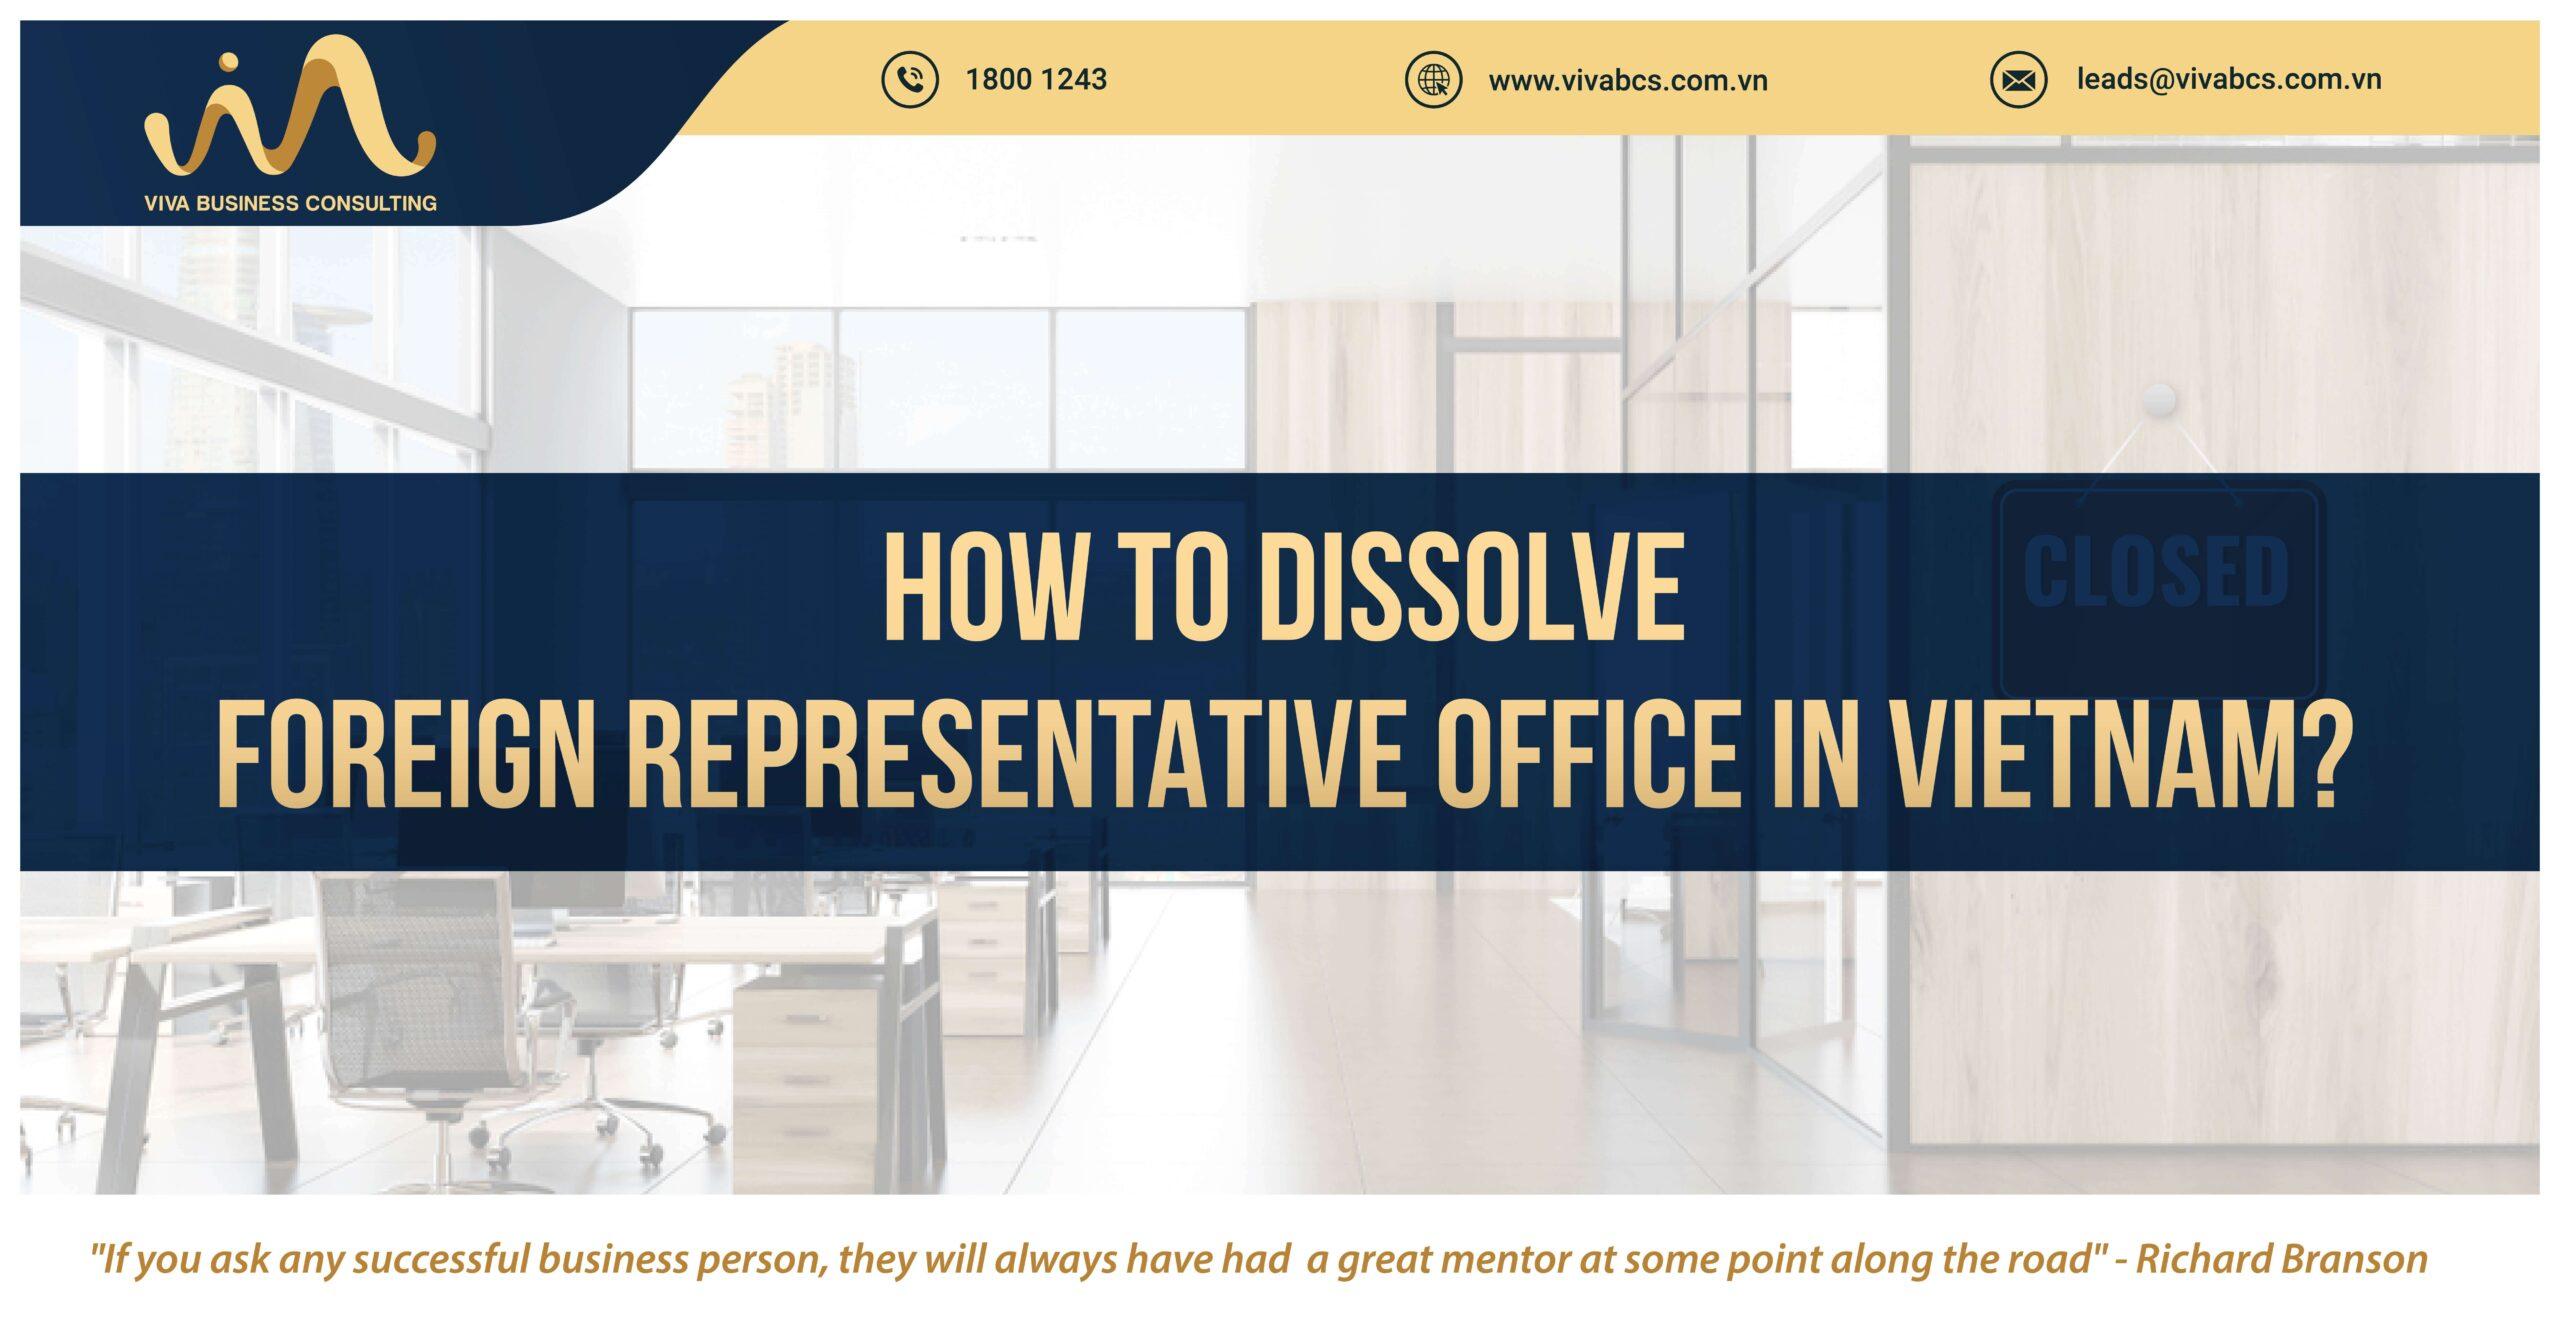 Dissolve Foreign Representative Office